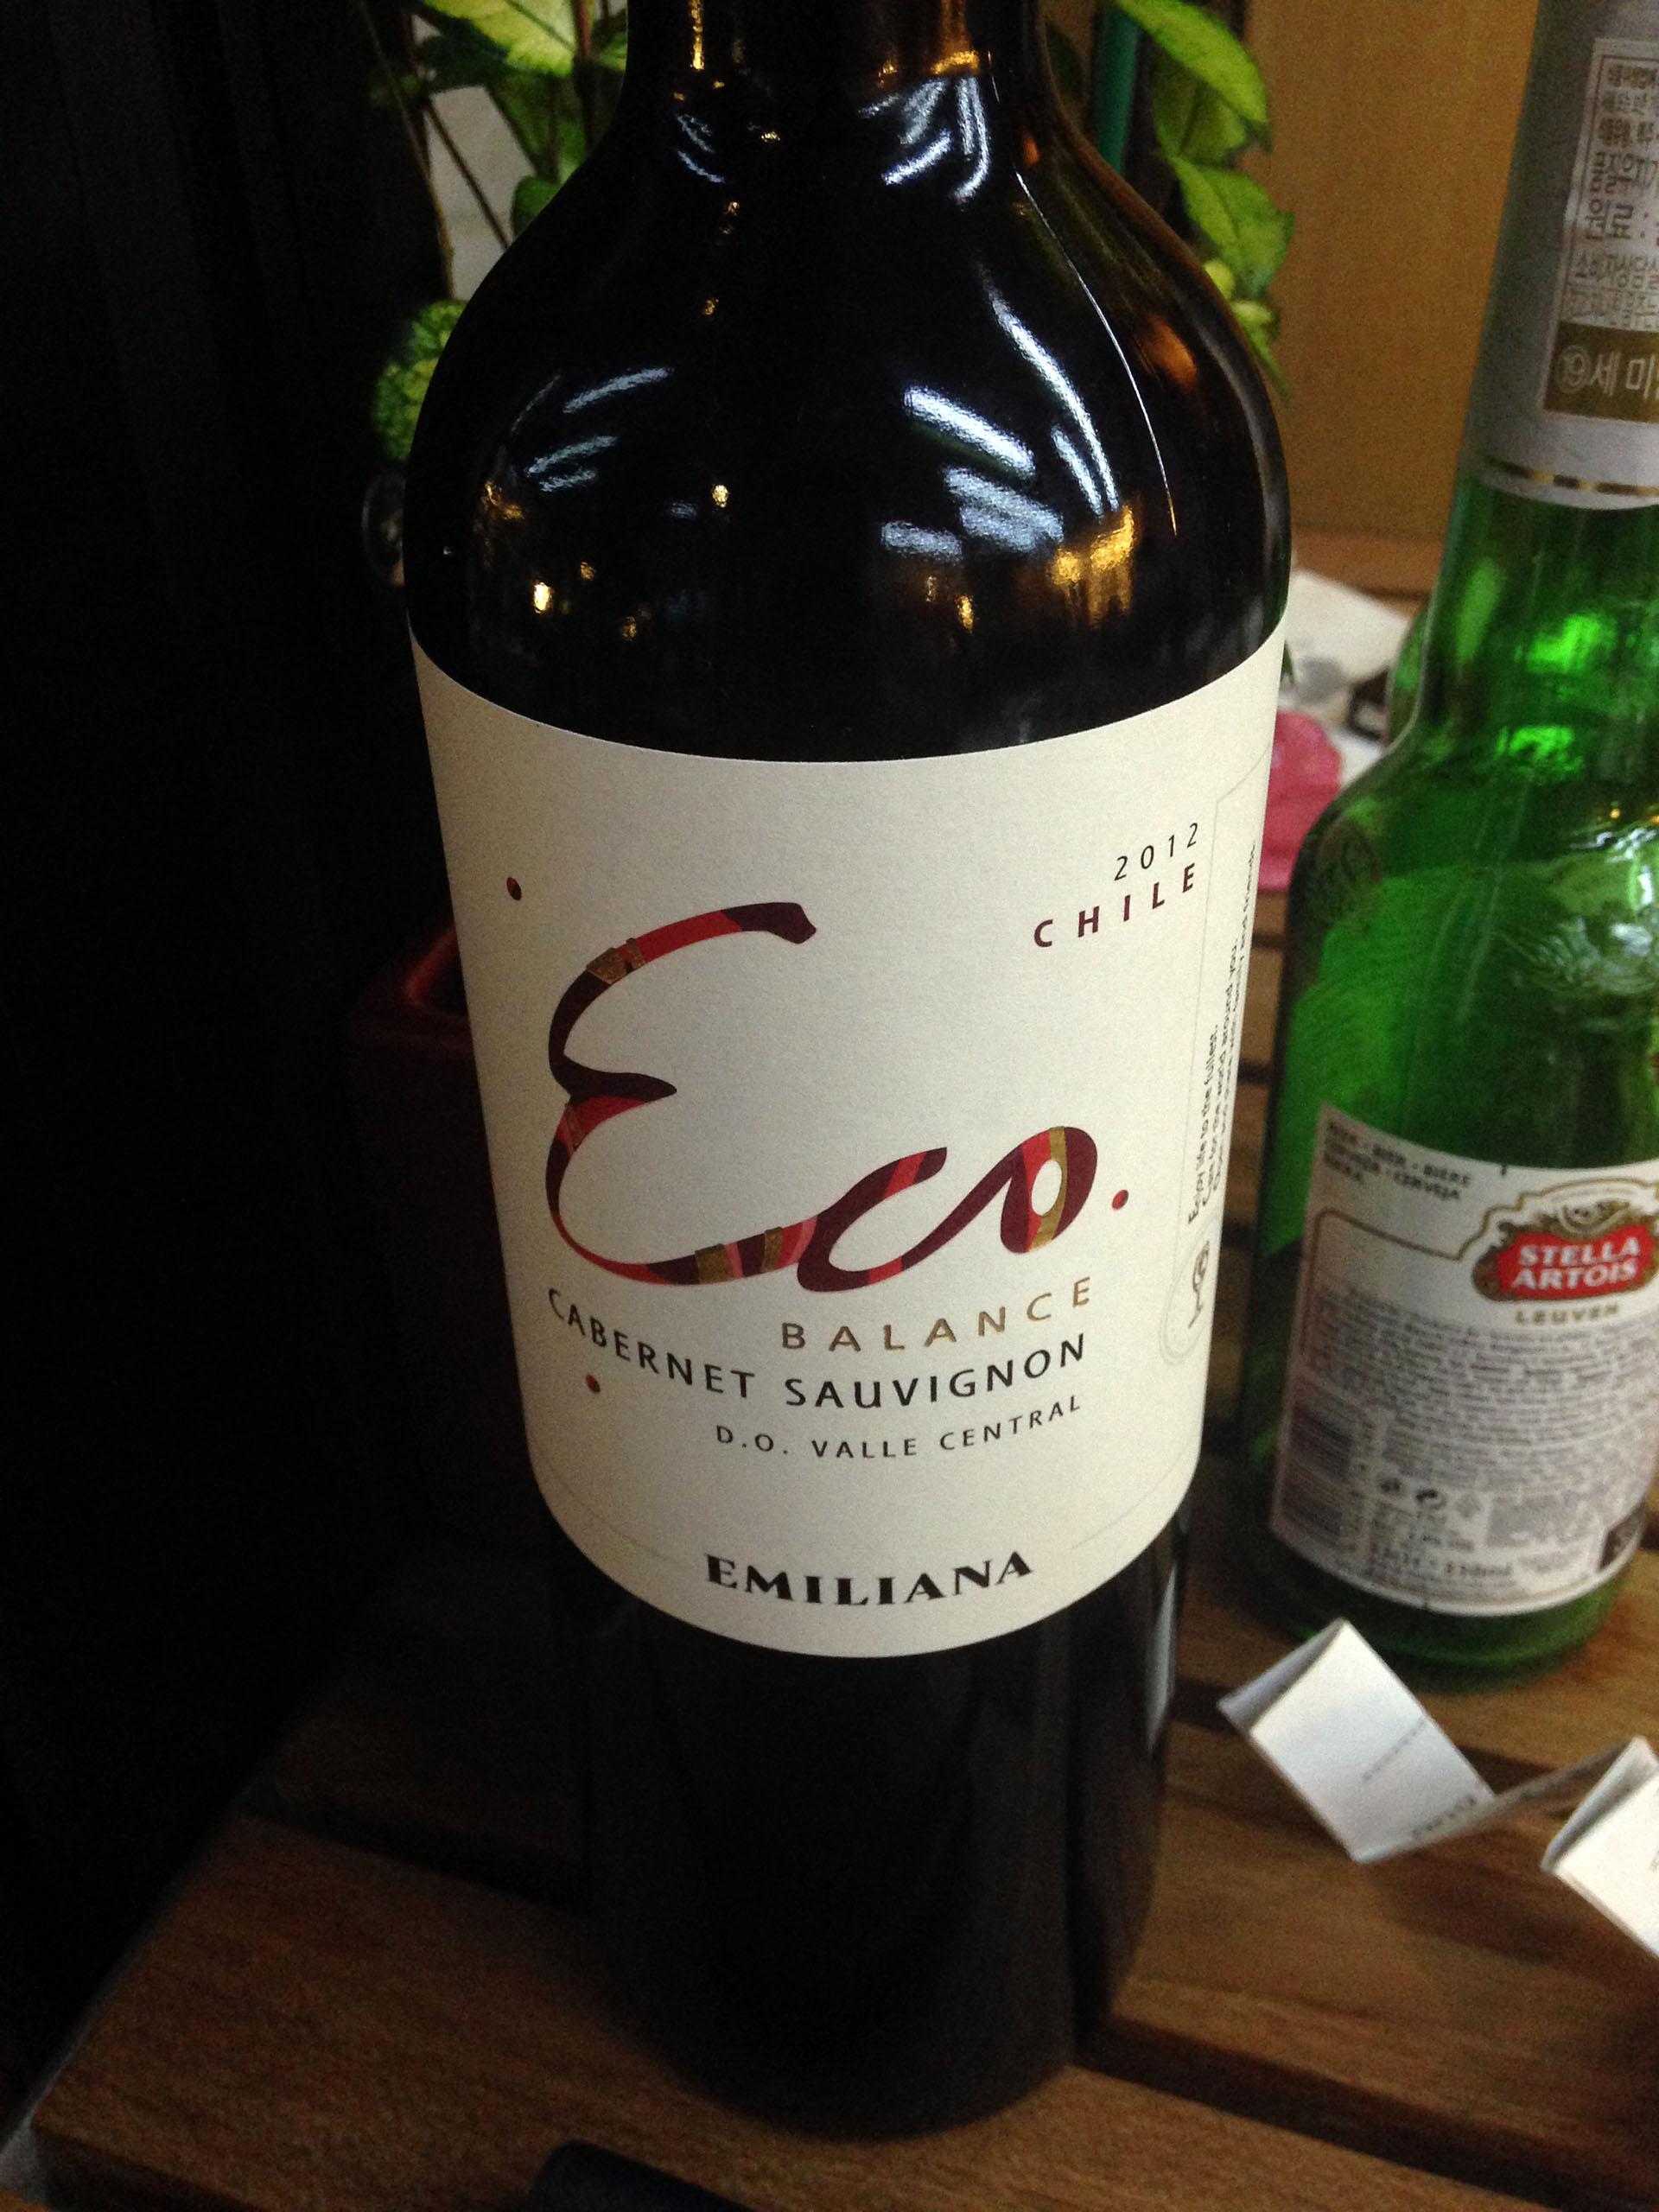 Emiliana, Ecobalance Cabernet Sauvignon 2012